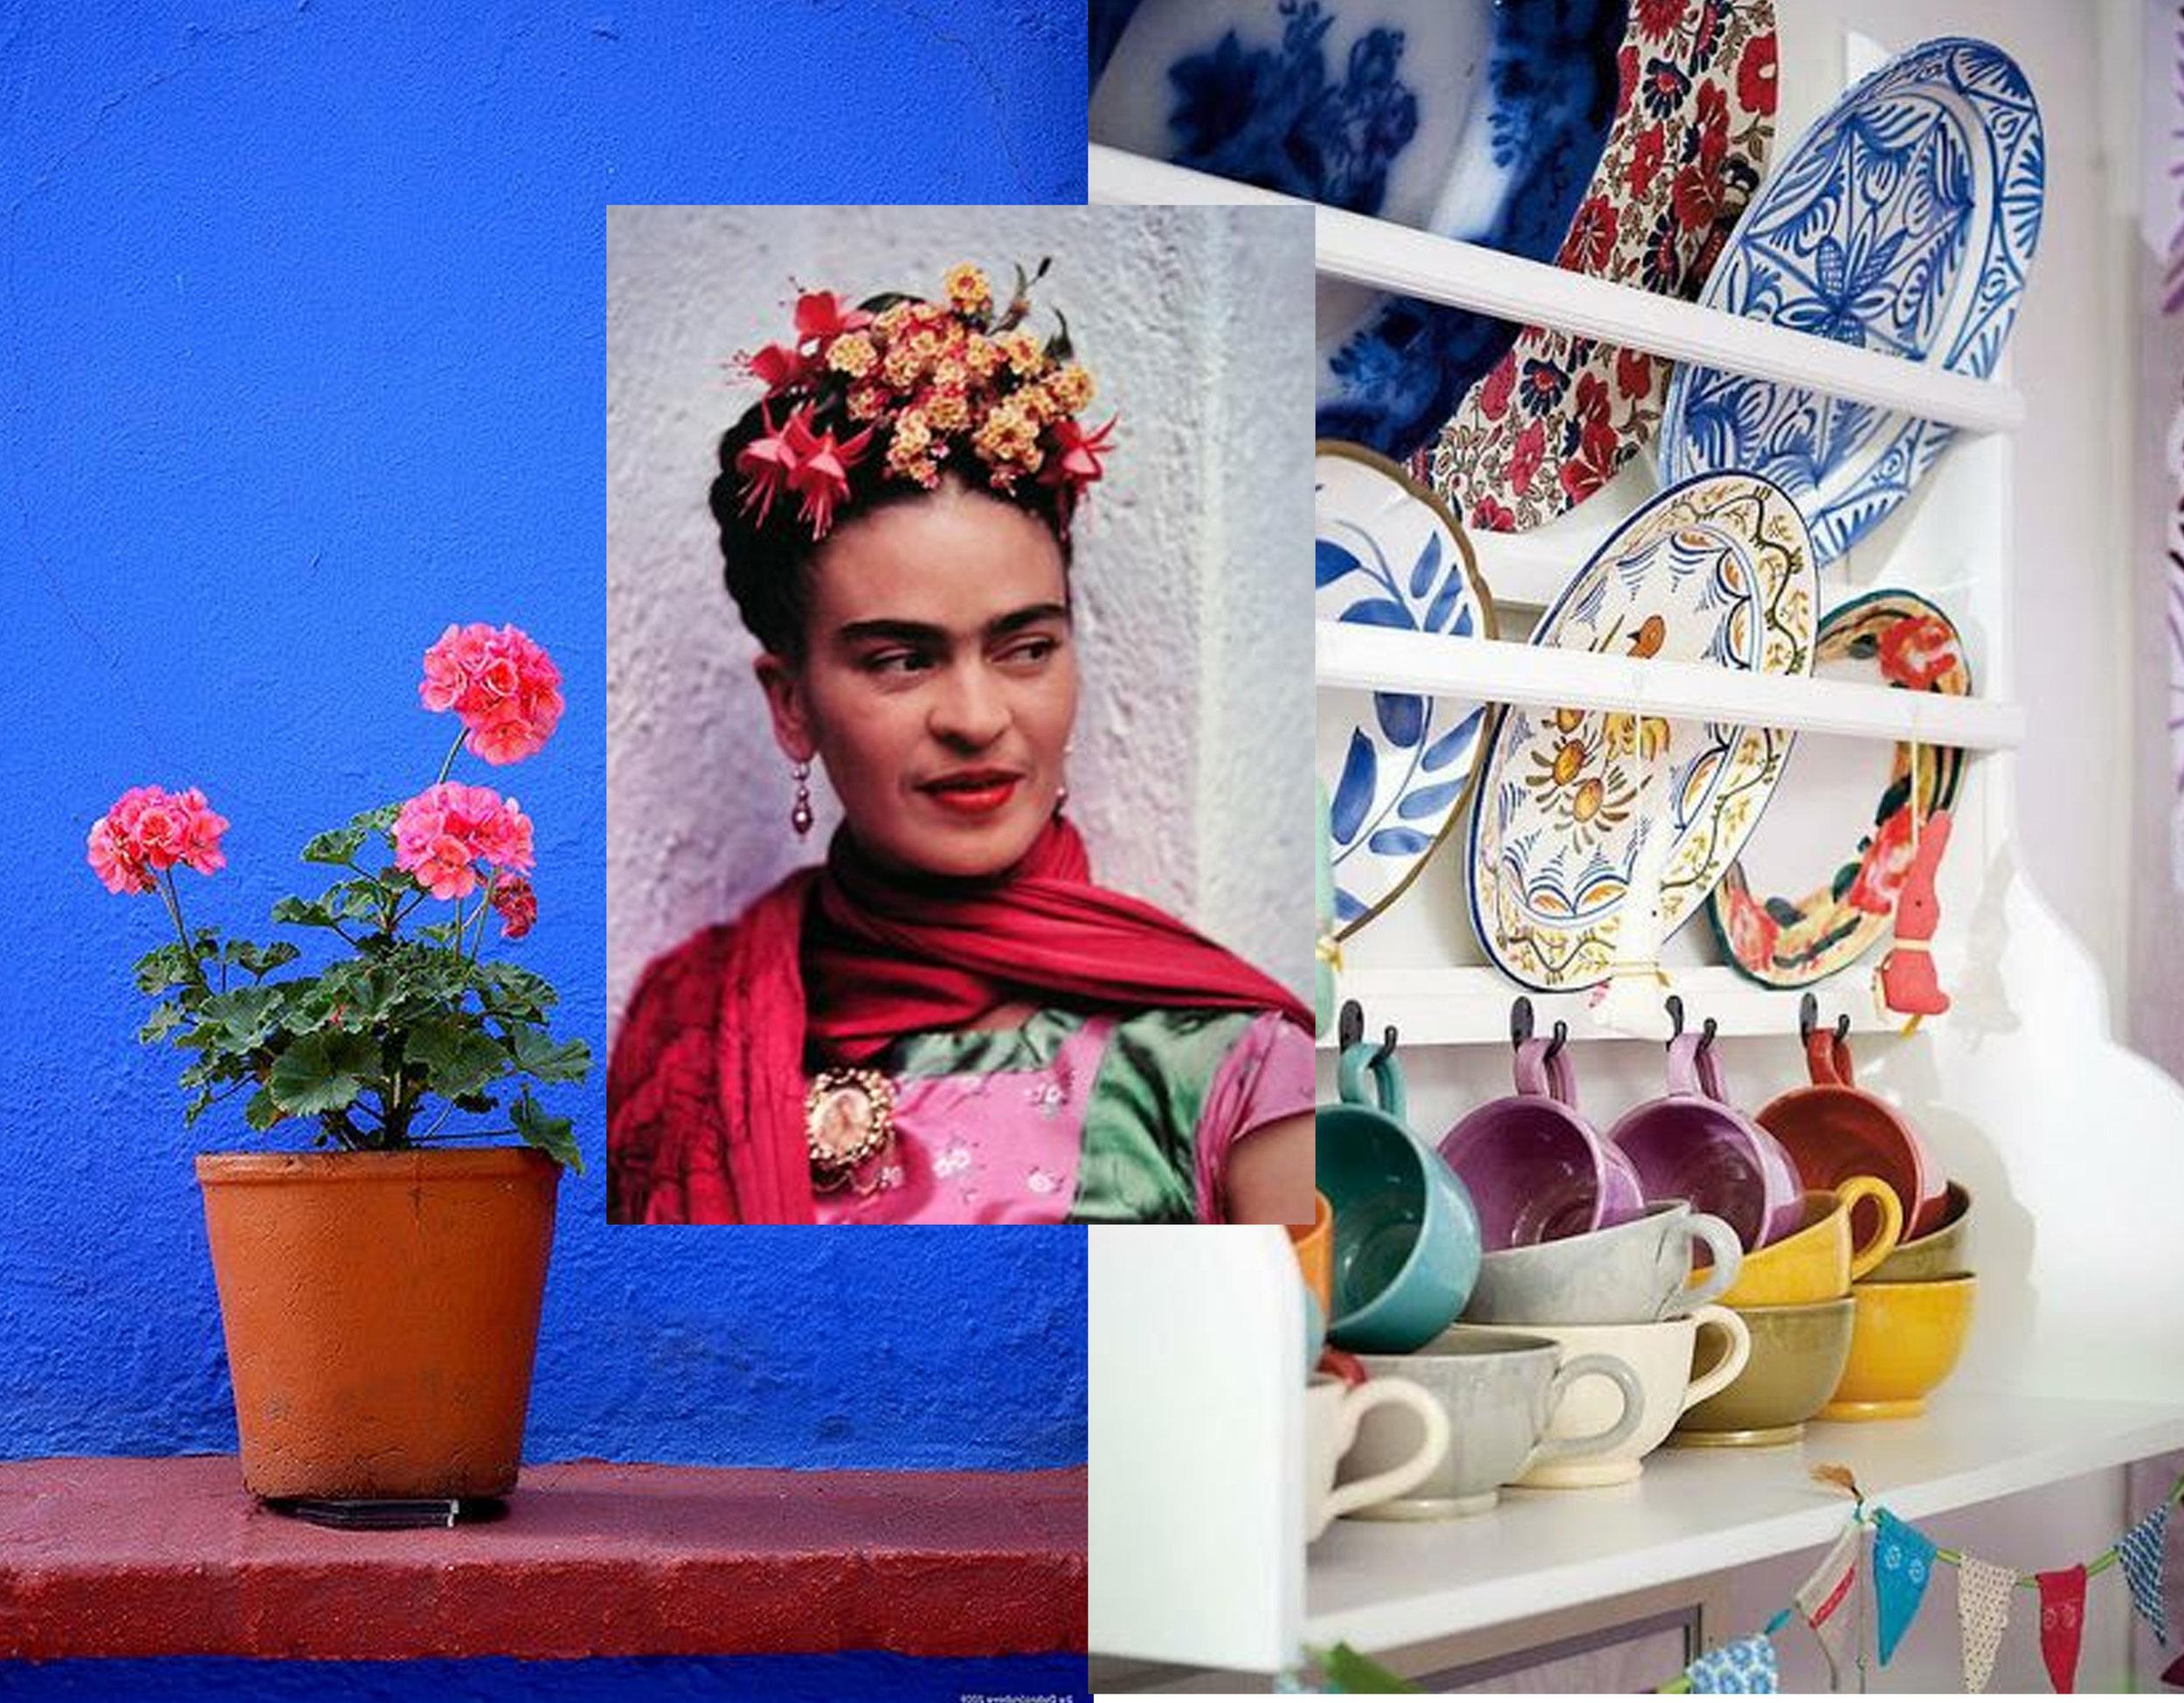 Casa Azul via  Flickr  - image Frida Kahlo via  Just Khadija  - image plates via  So Darling